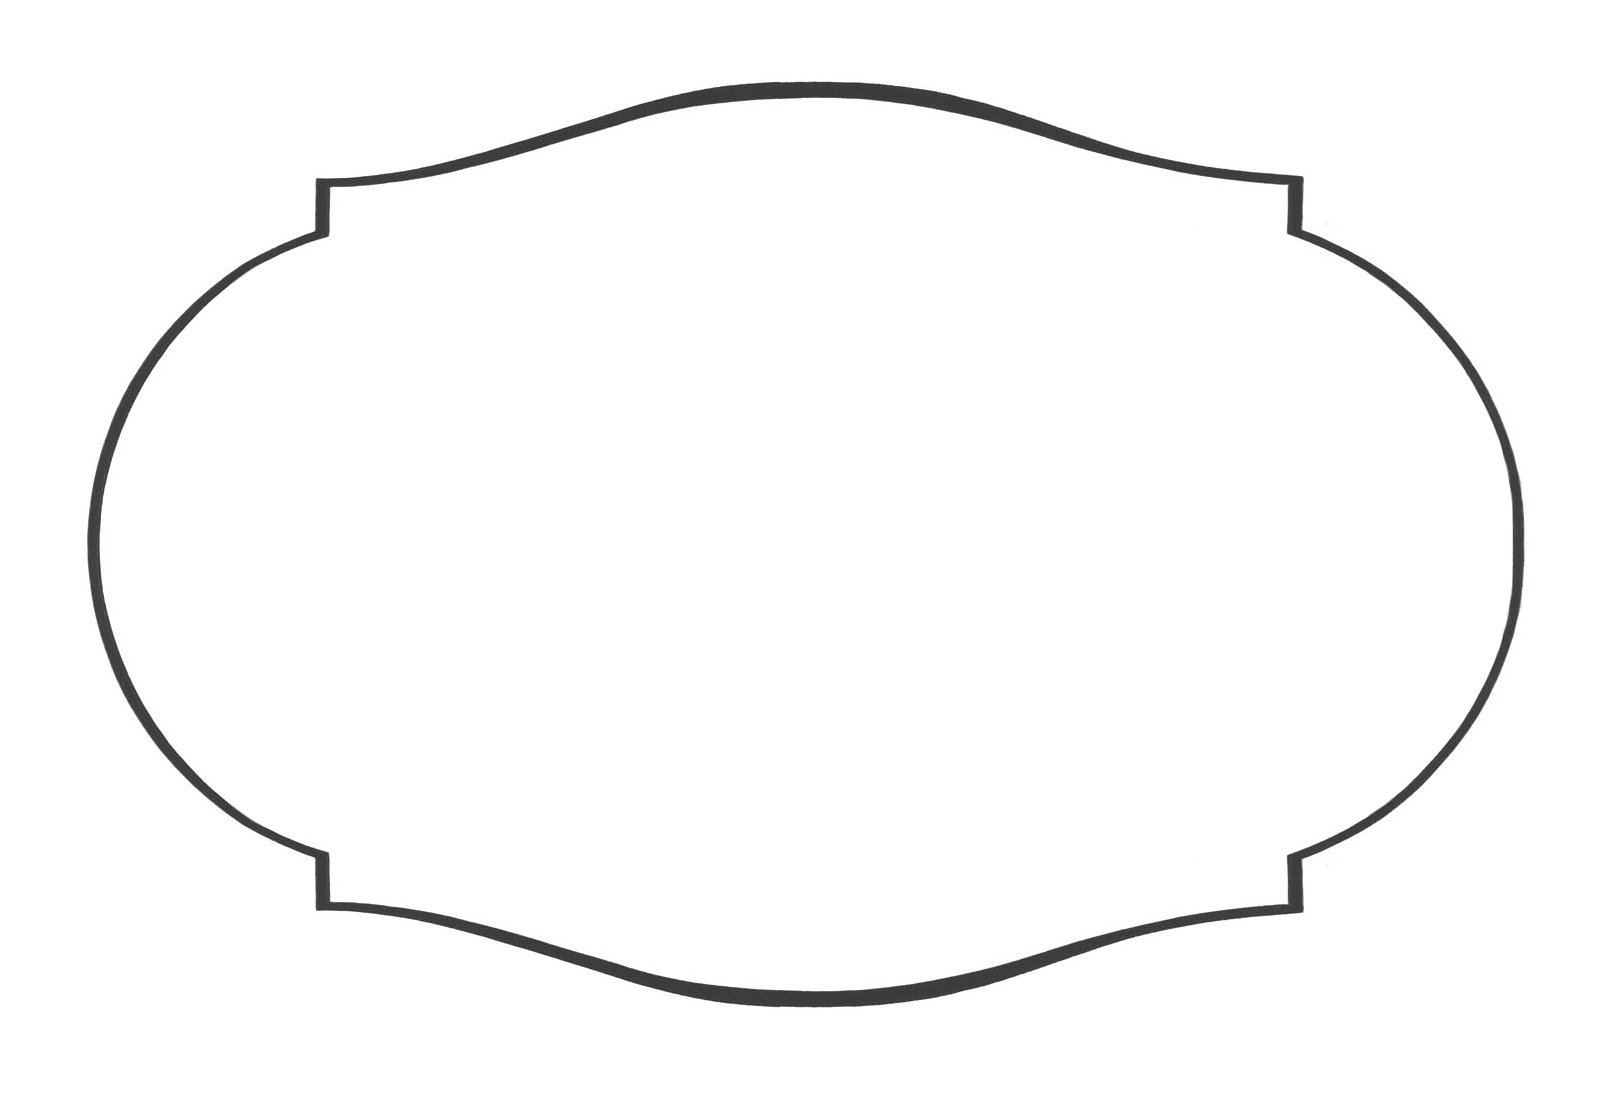 Clip Art Label Shapes